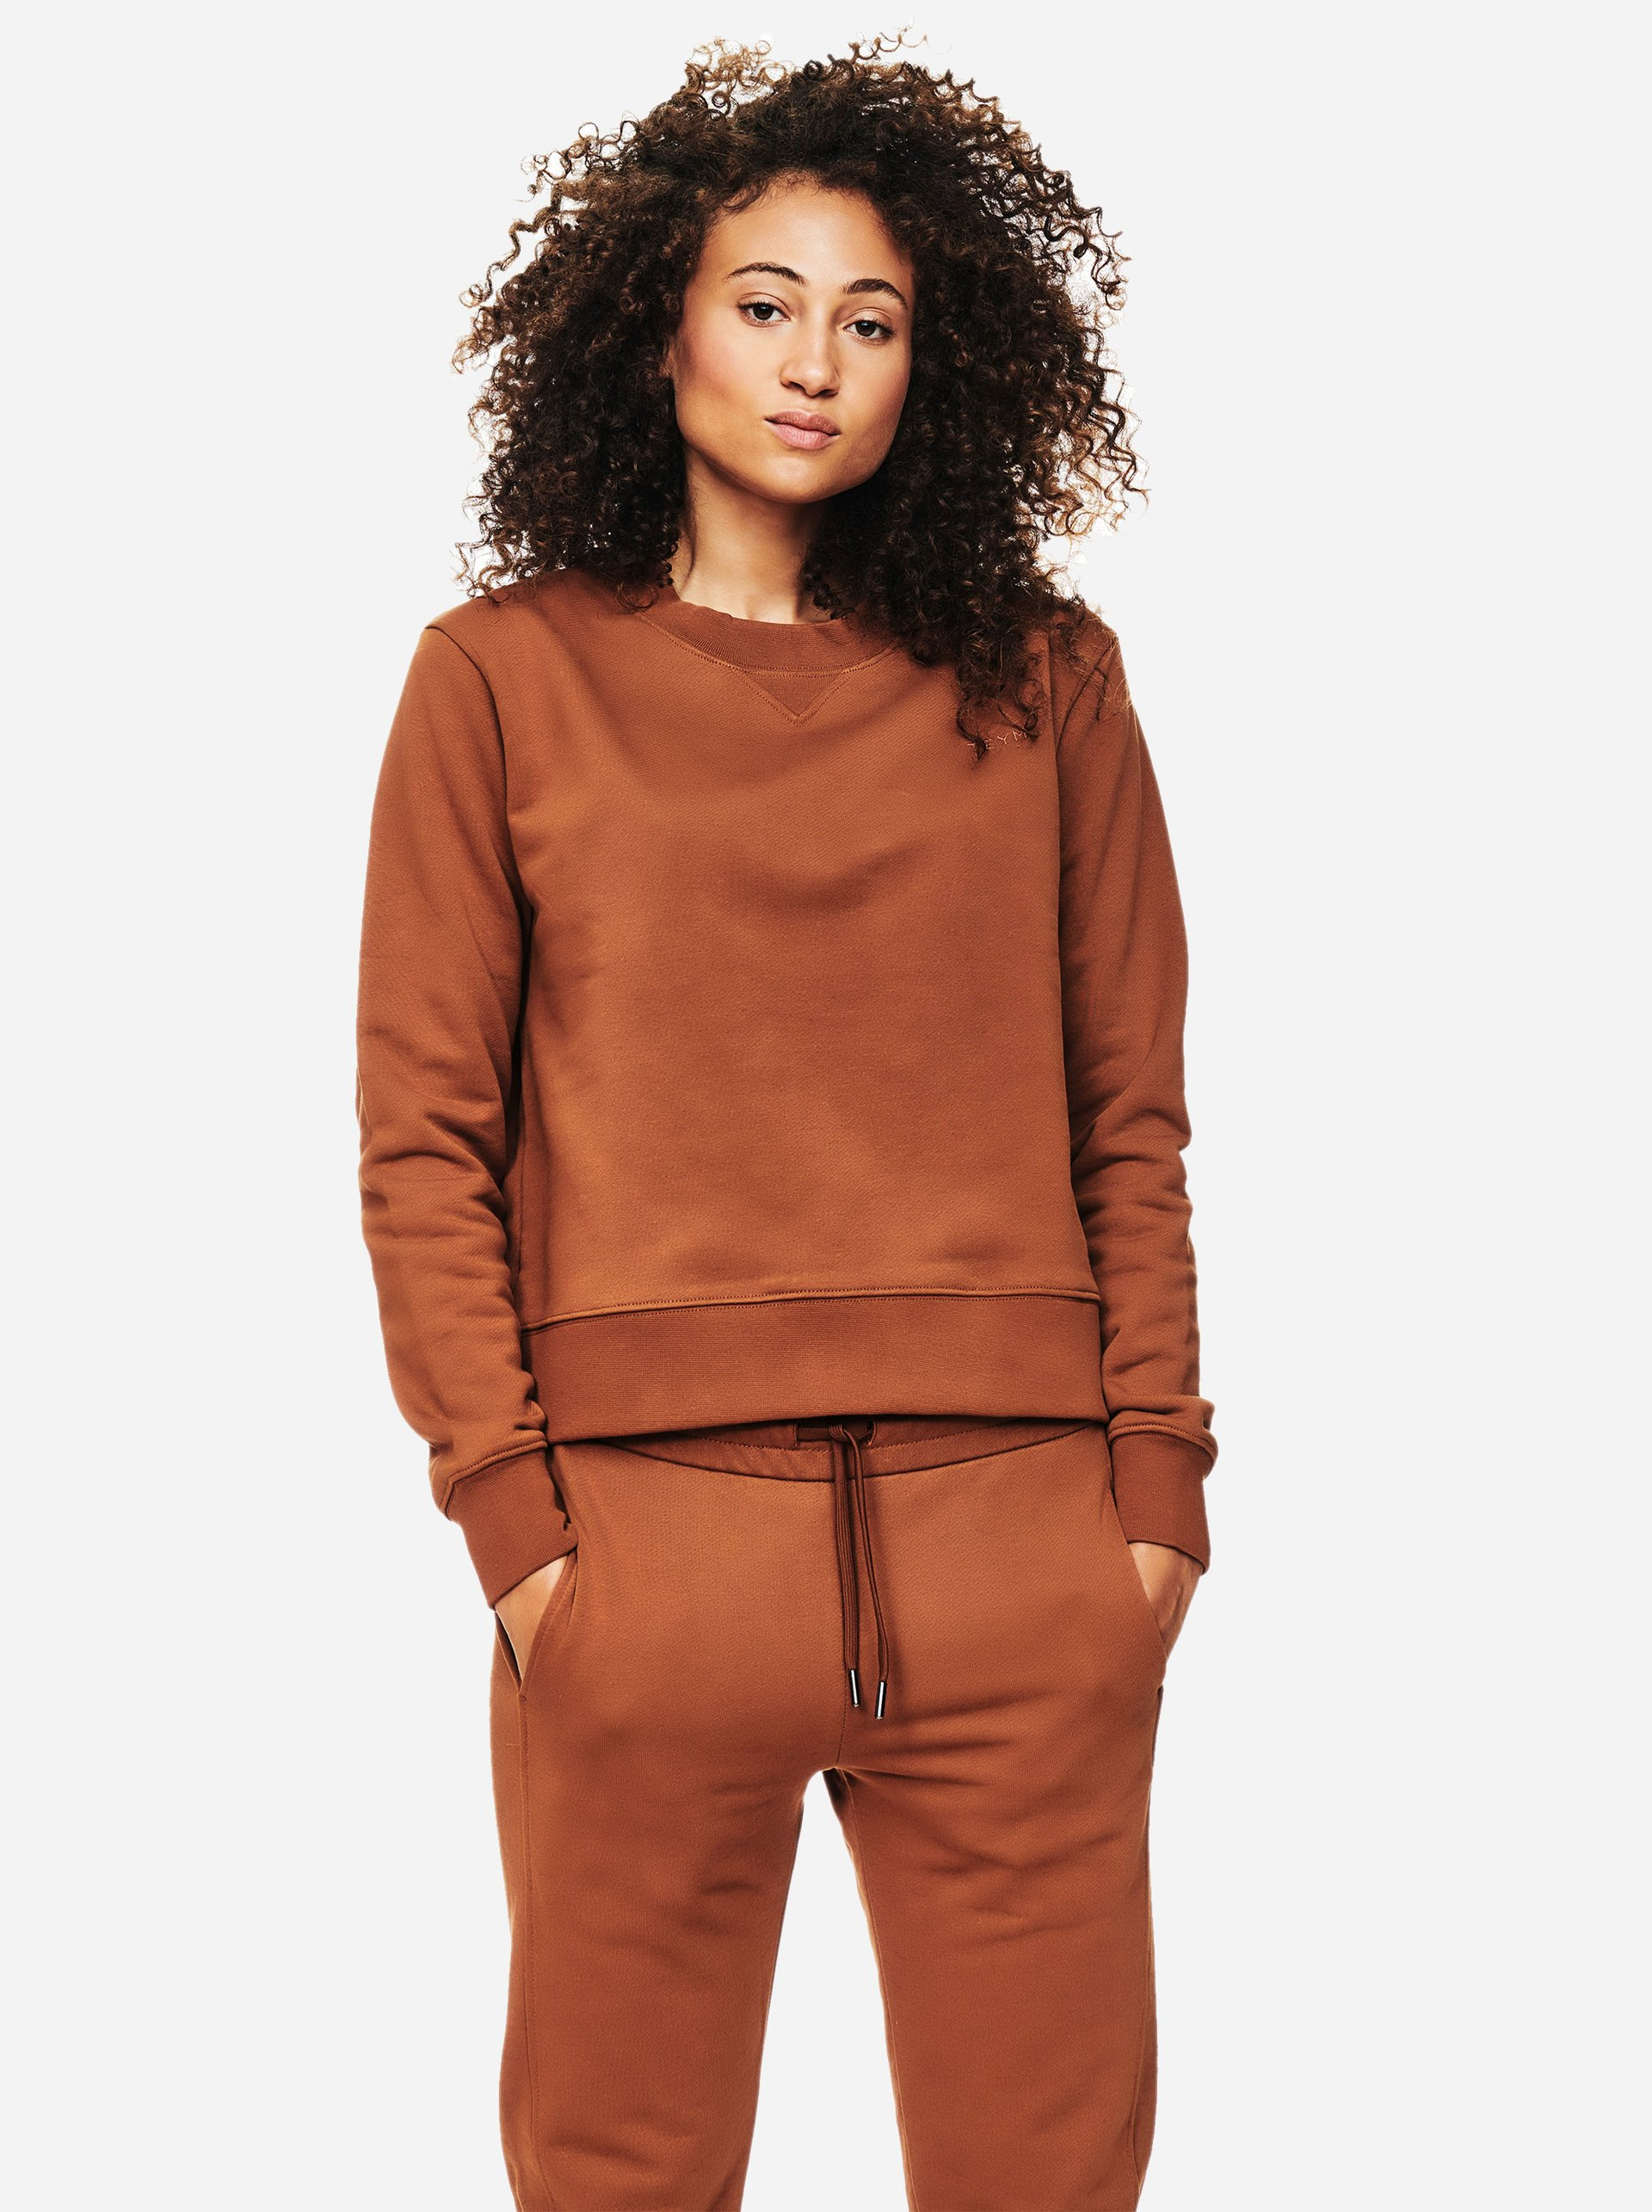 Teym-TheSweatshirt-Women-Camel01